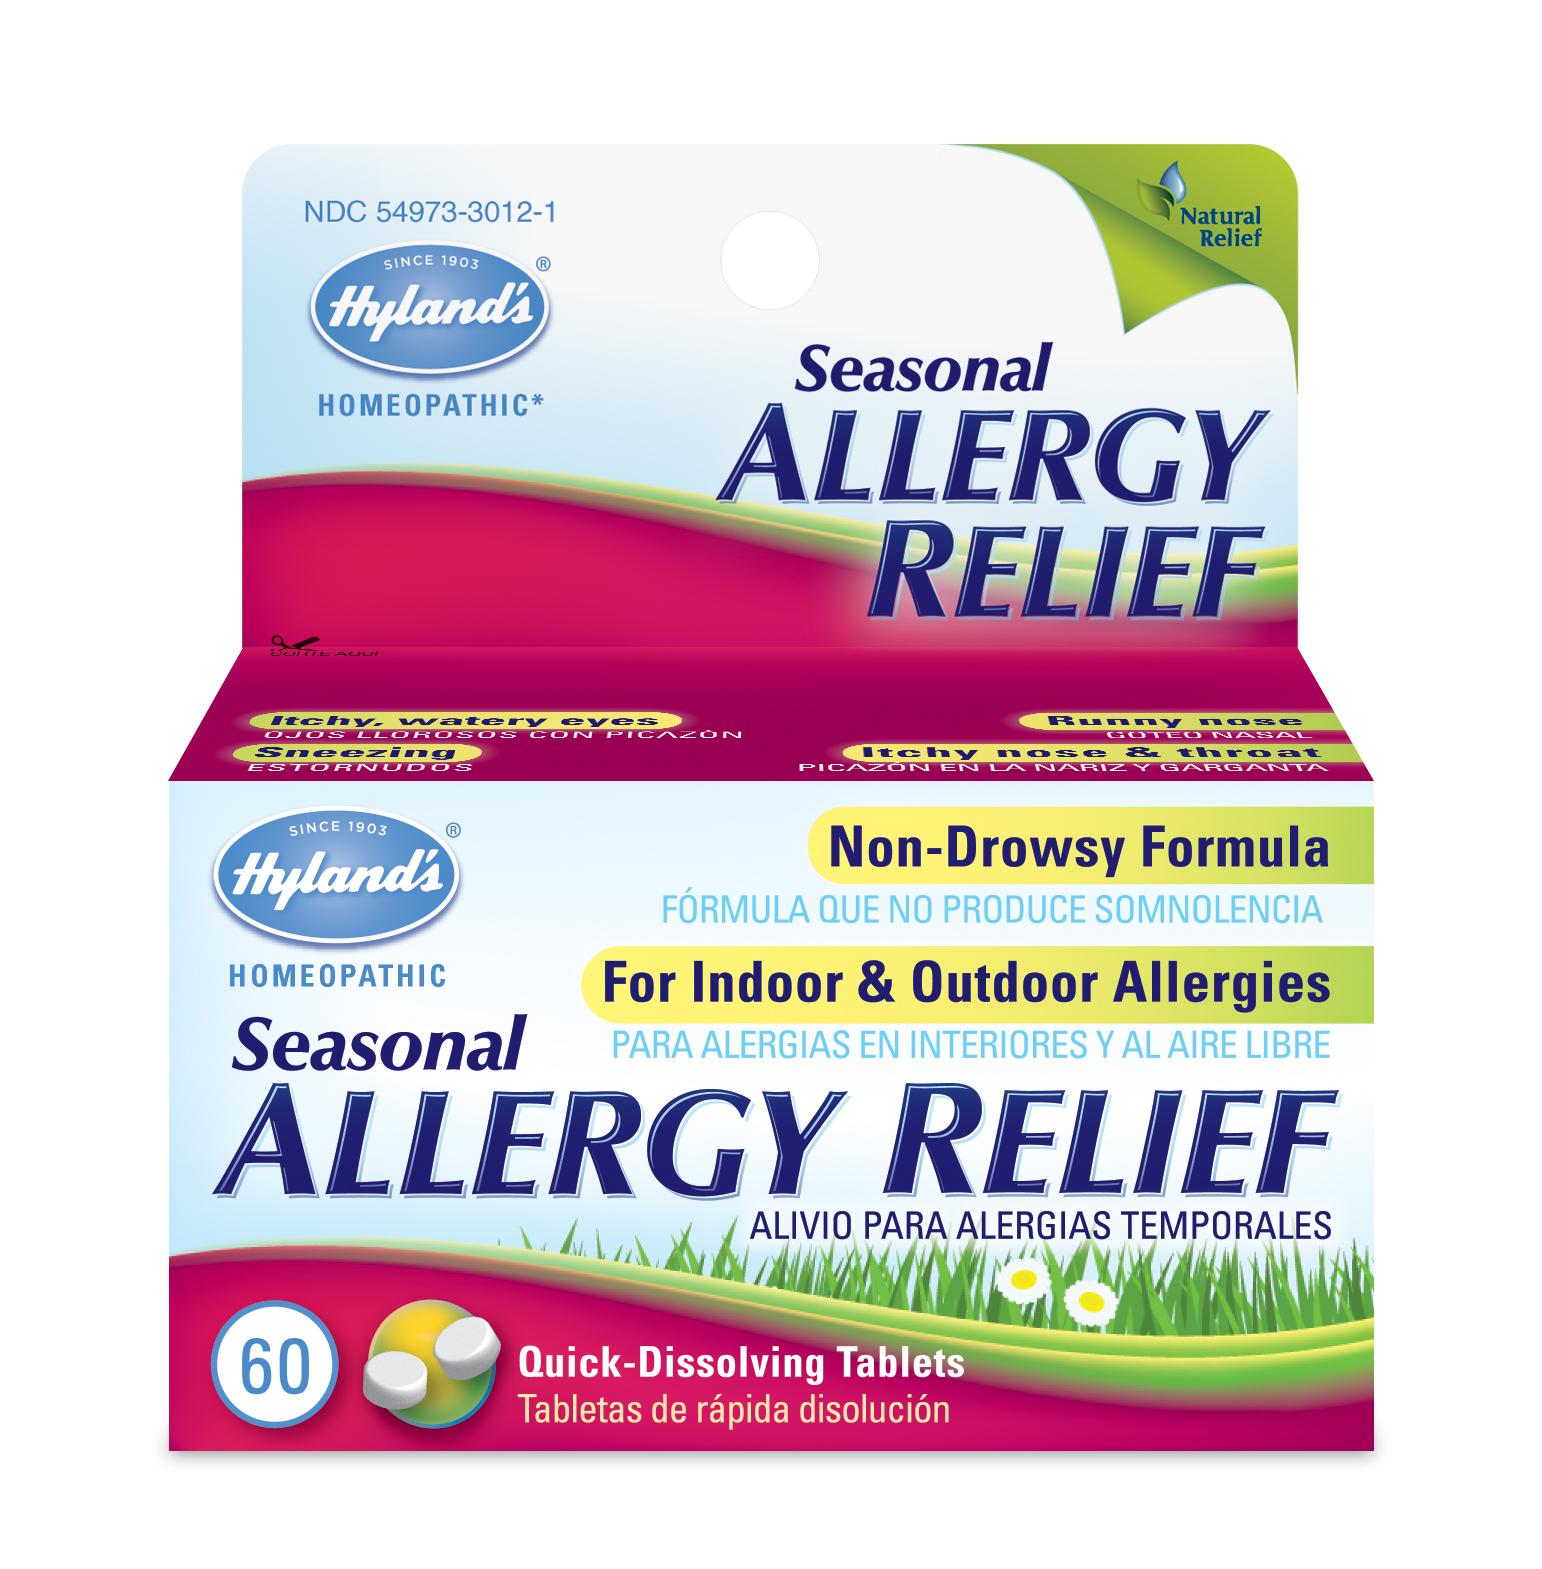 Seasonal Allergy Relief, 60 Quick-Dissolving Tablets - Walmart.com -  Walmart.com